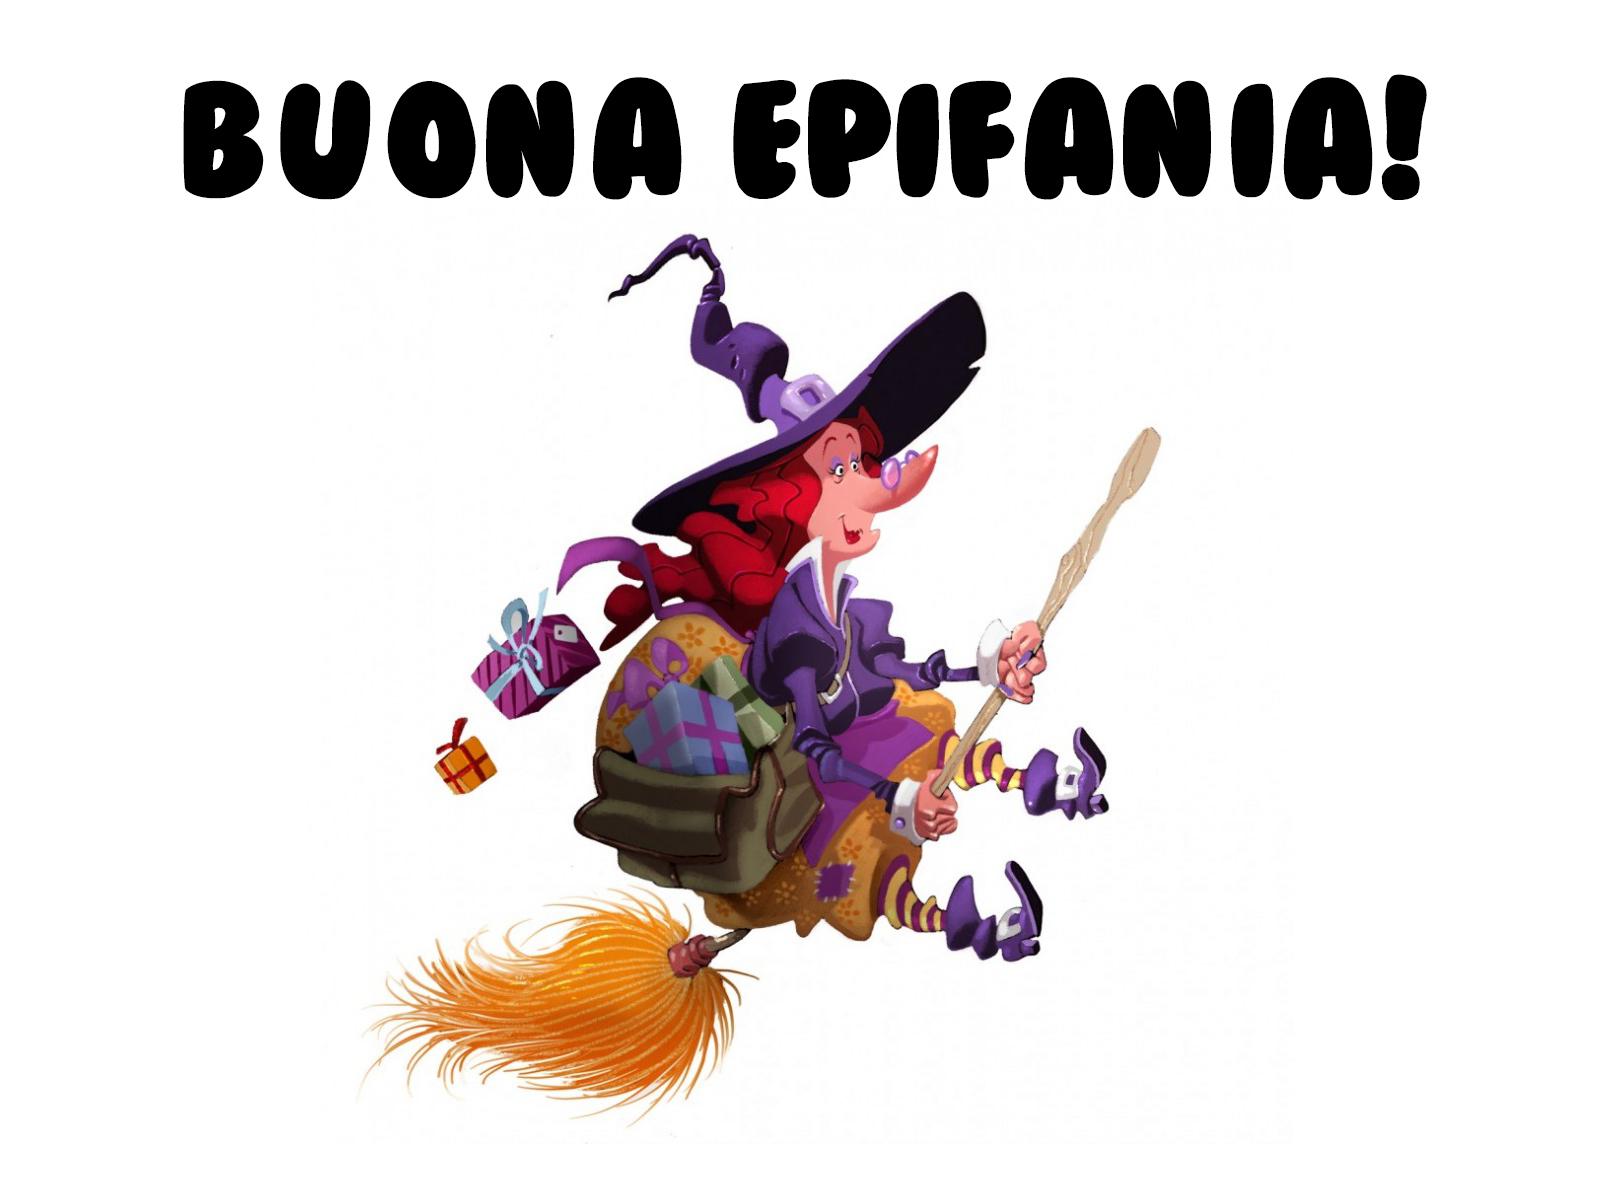 sfondo-epifania-1600x1200-2